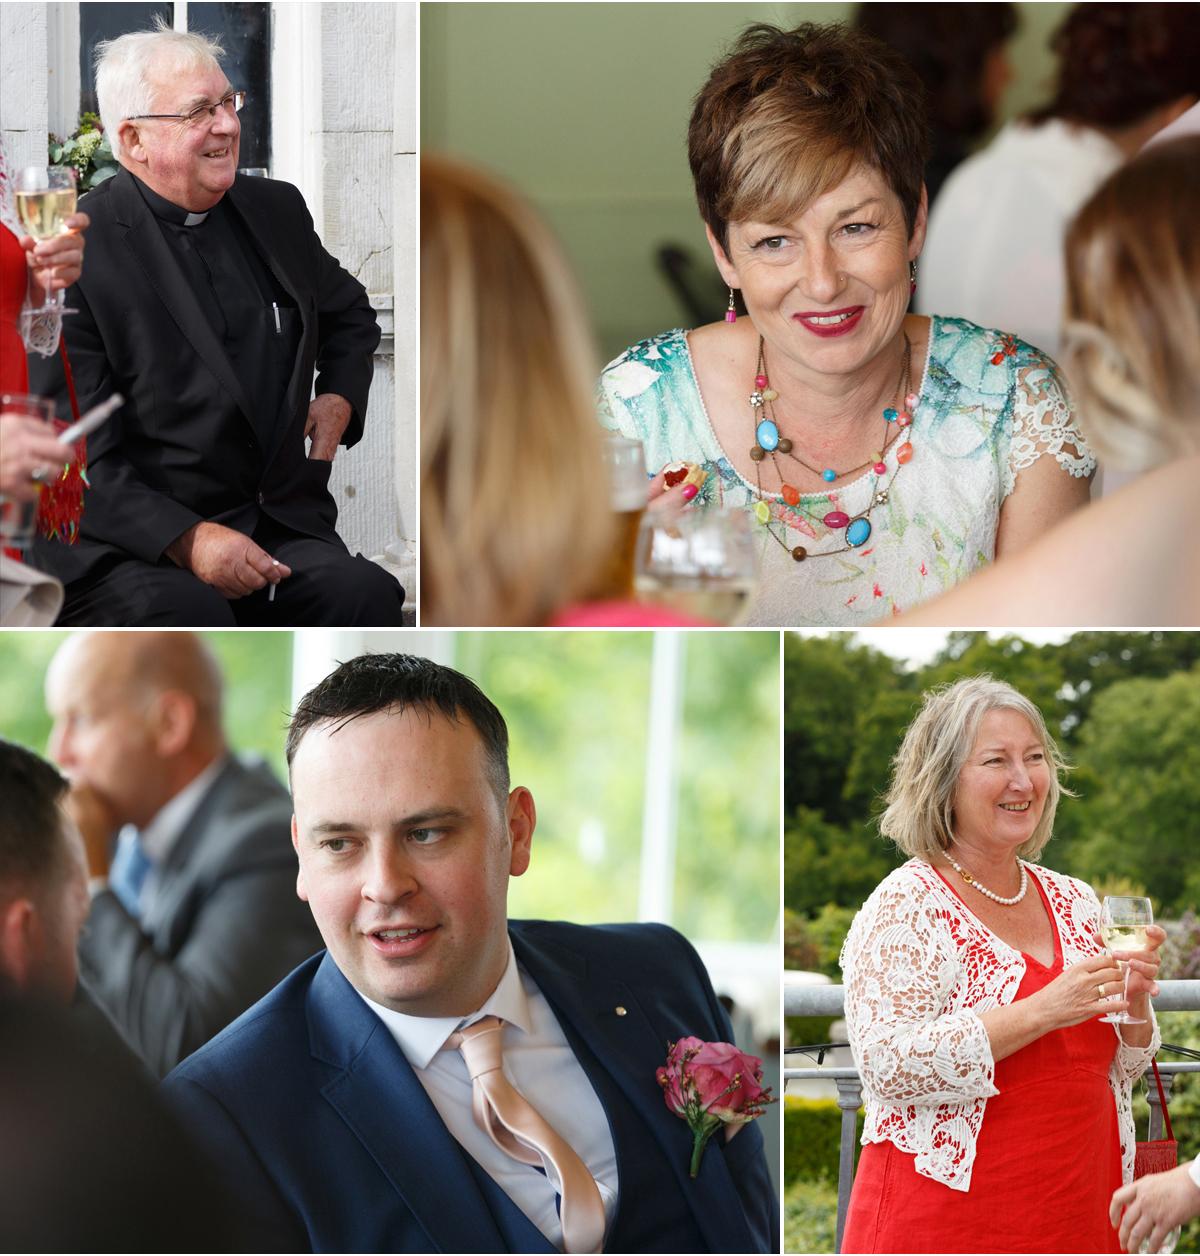 candid wedding photography of wedding guests